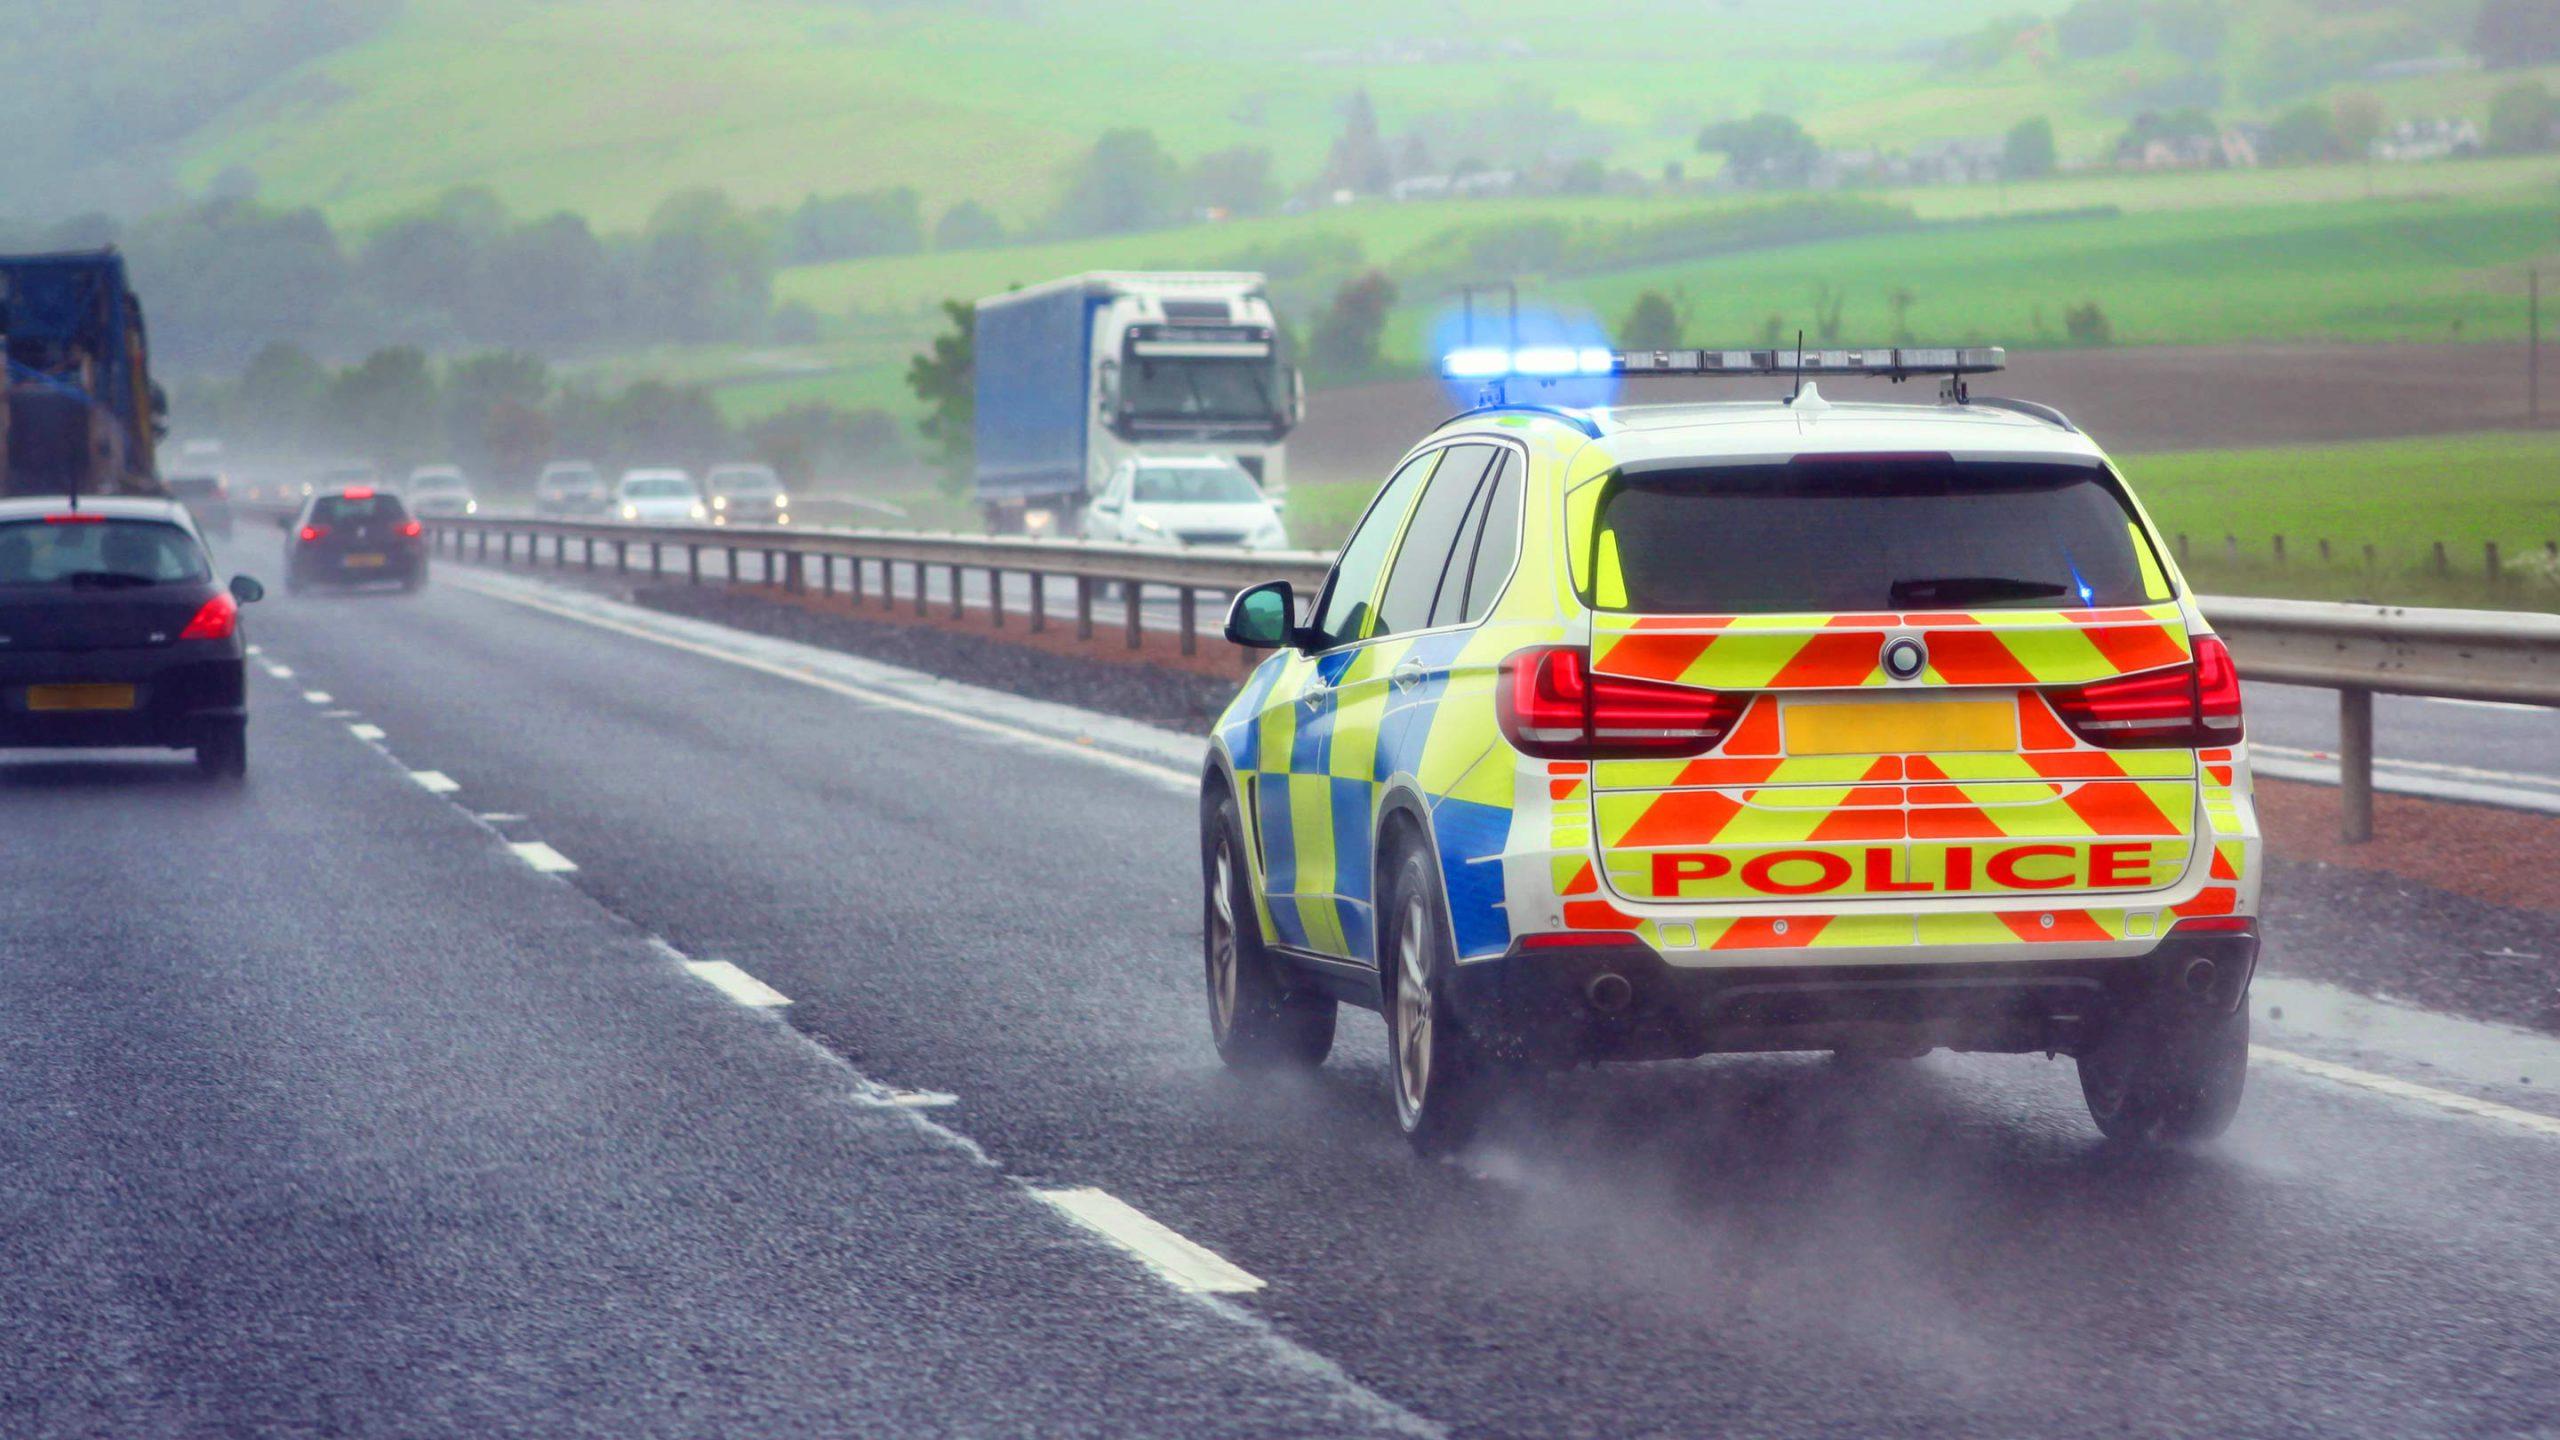 Emergency service fleet management